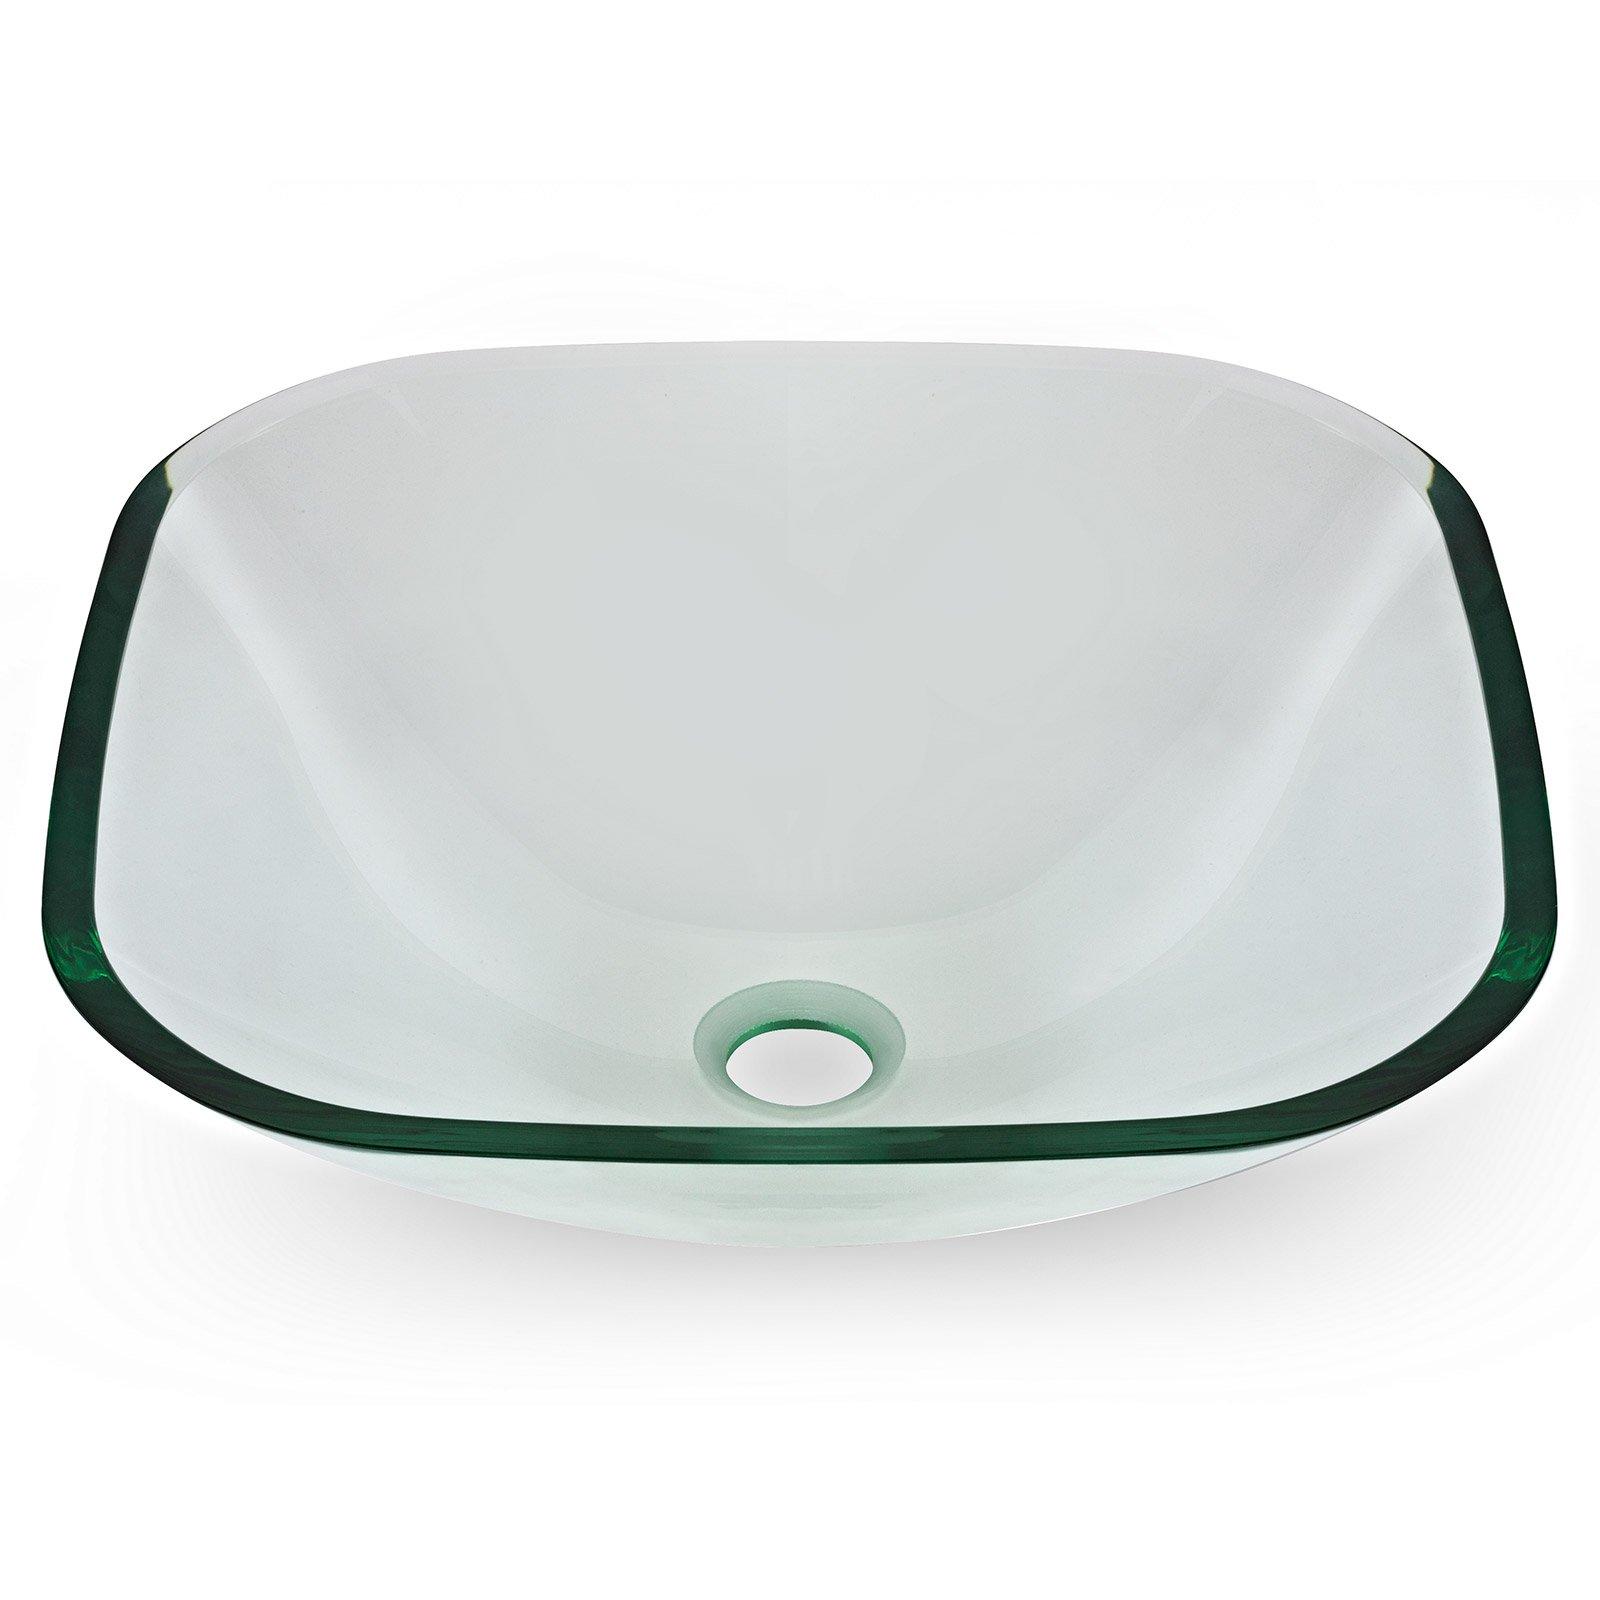 Miligoré Modern Glass Vessel Sink - Above Counter Bathroom Vanity Basin Bowl - Square Clear